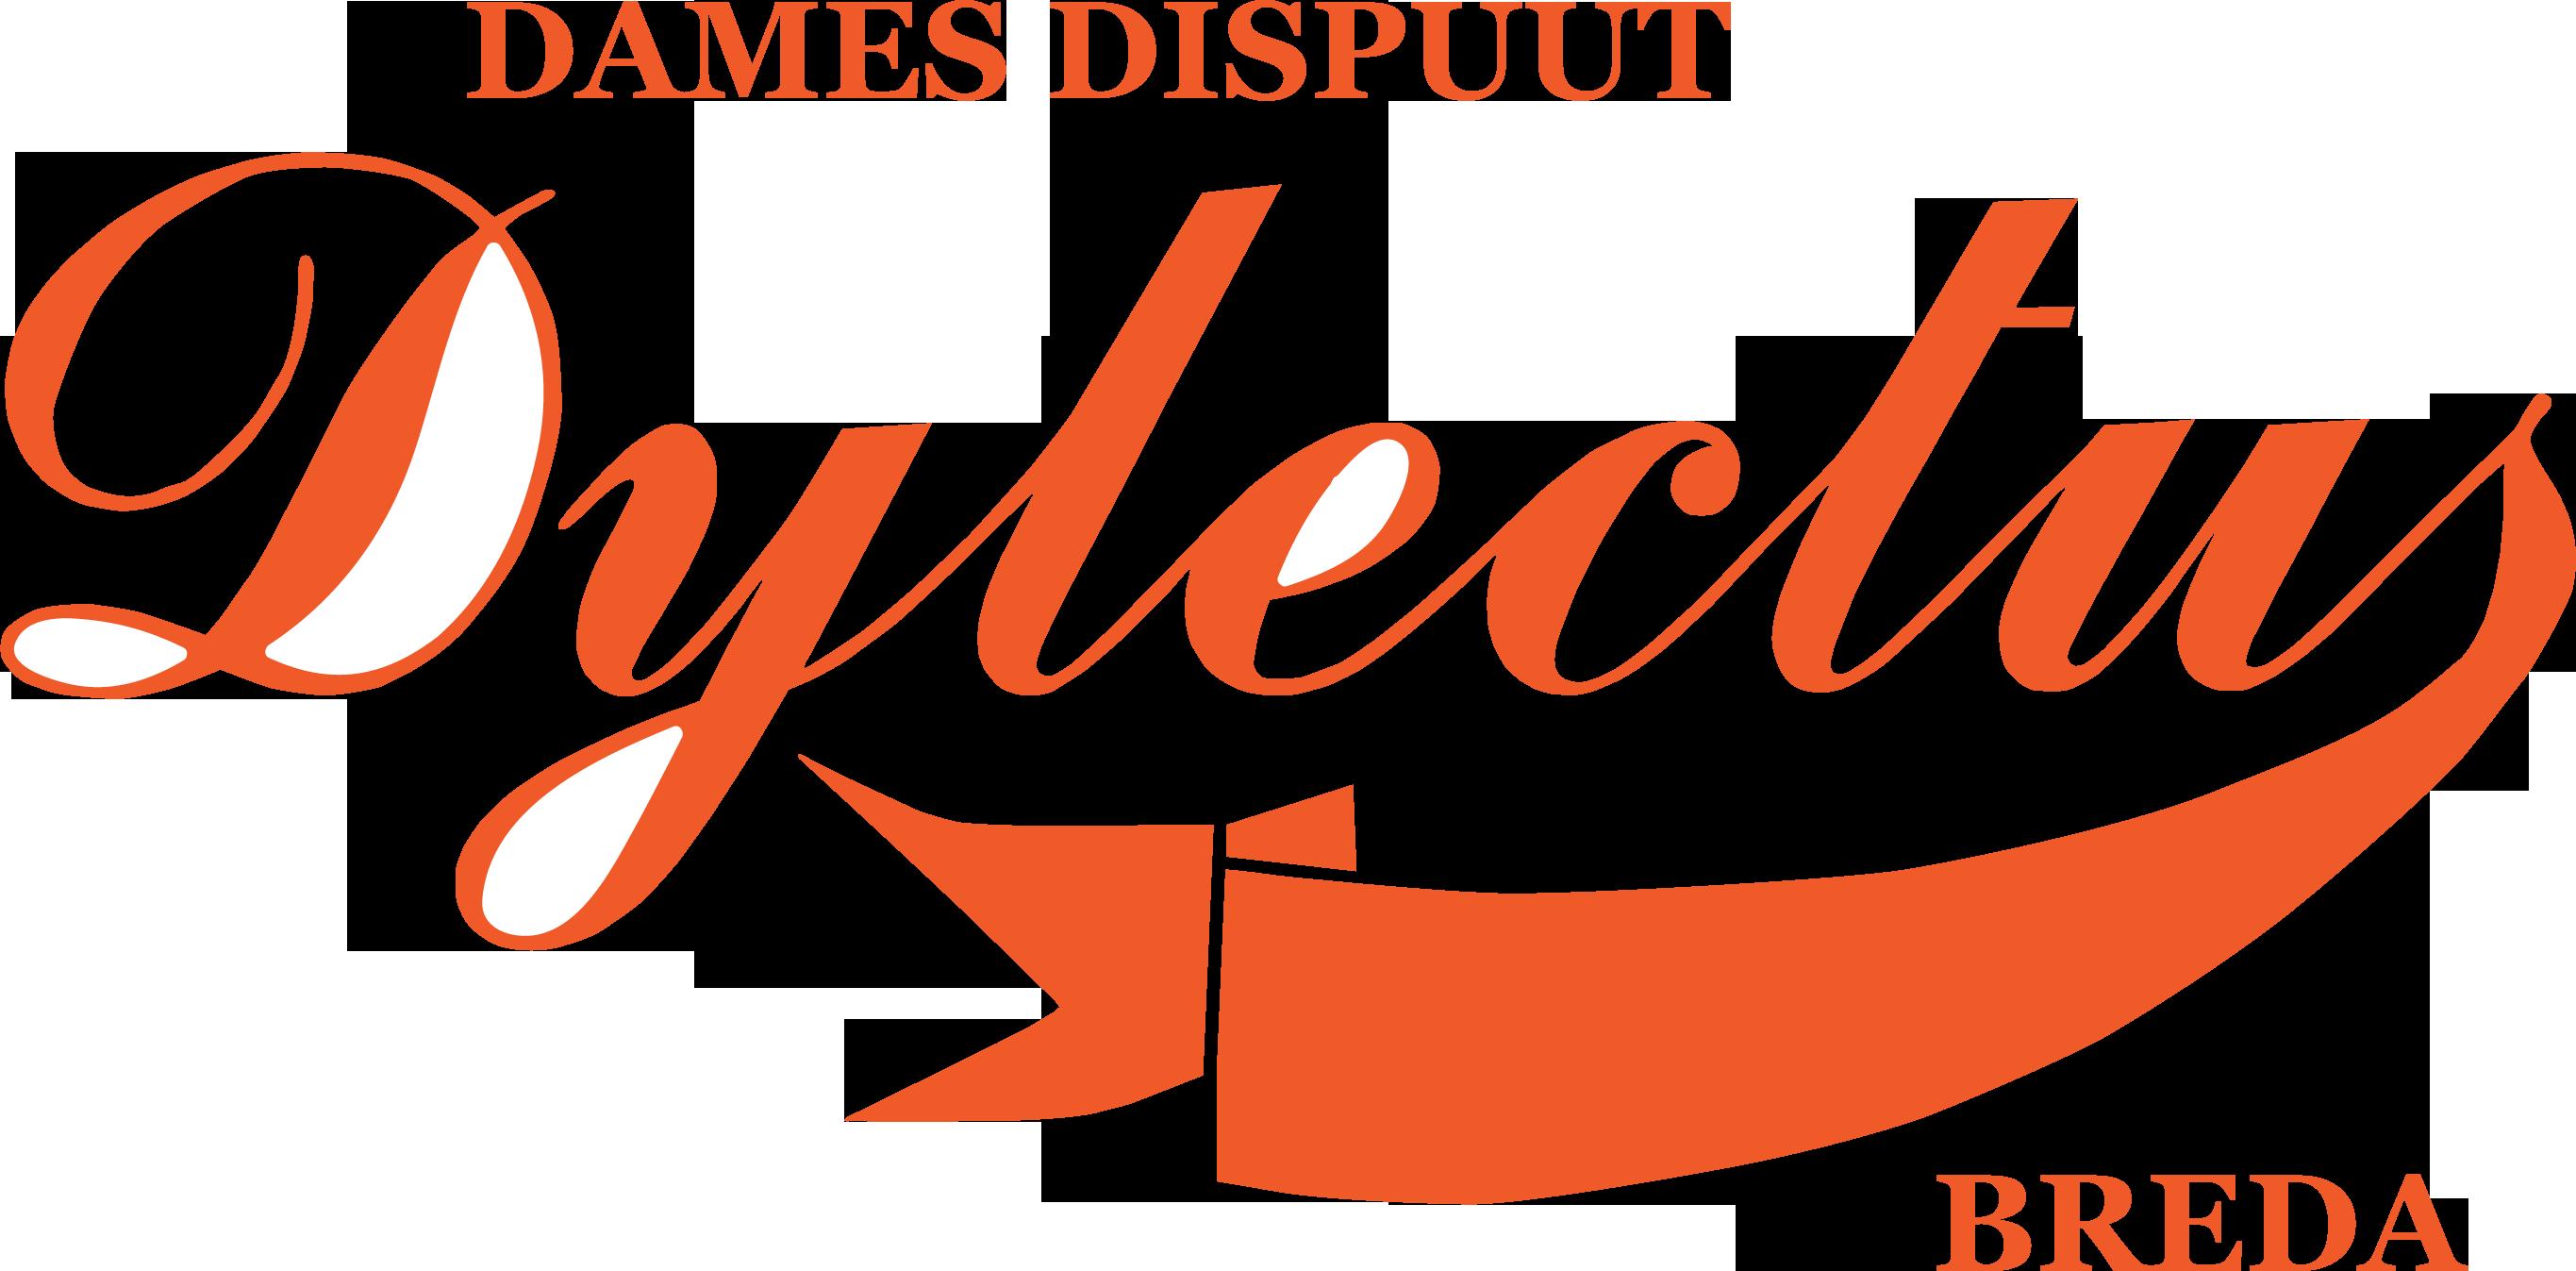 Dames Dispuut Dylectus